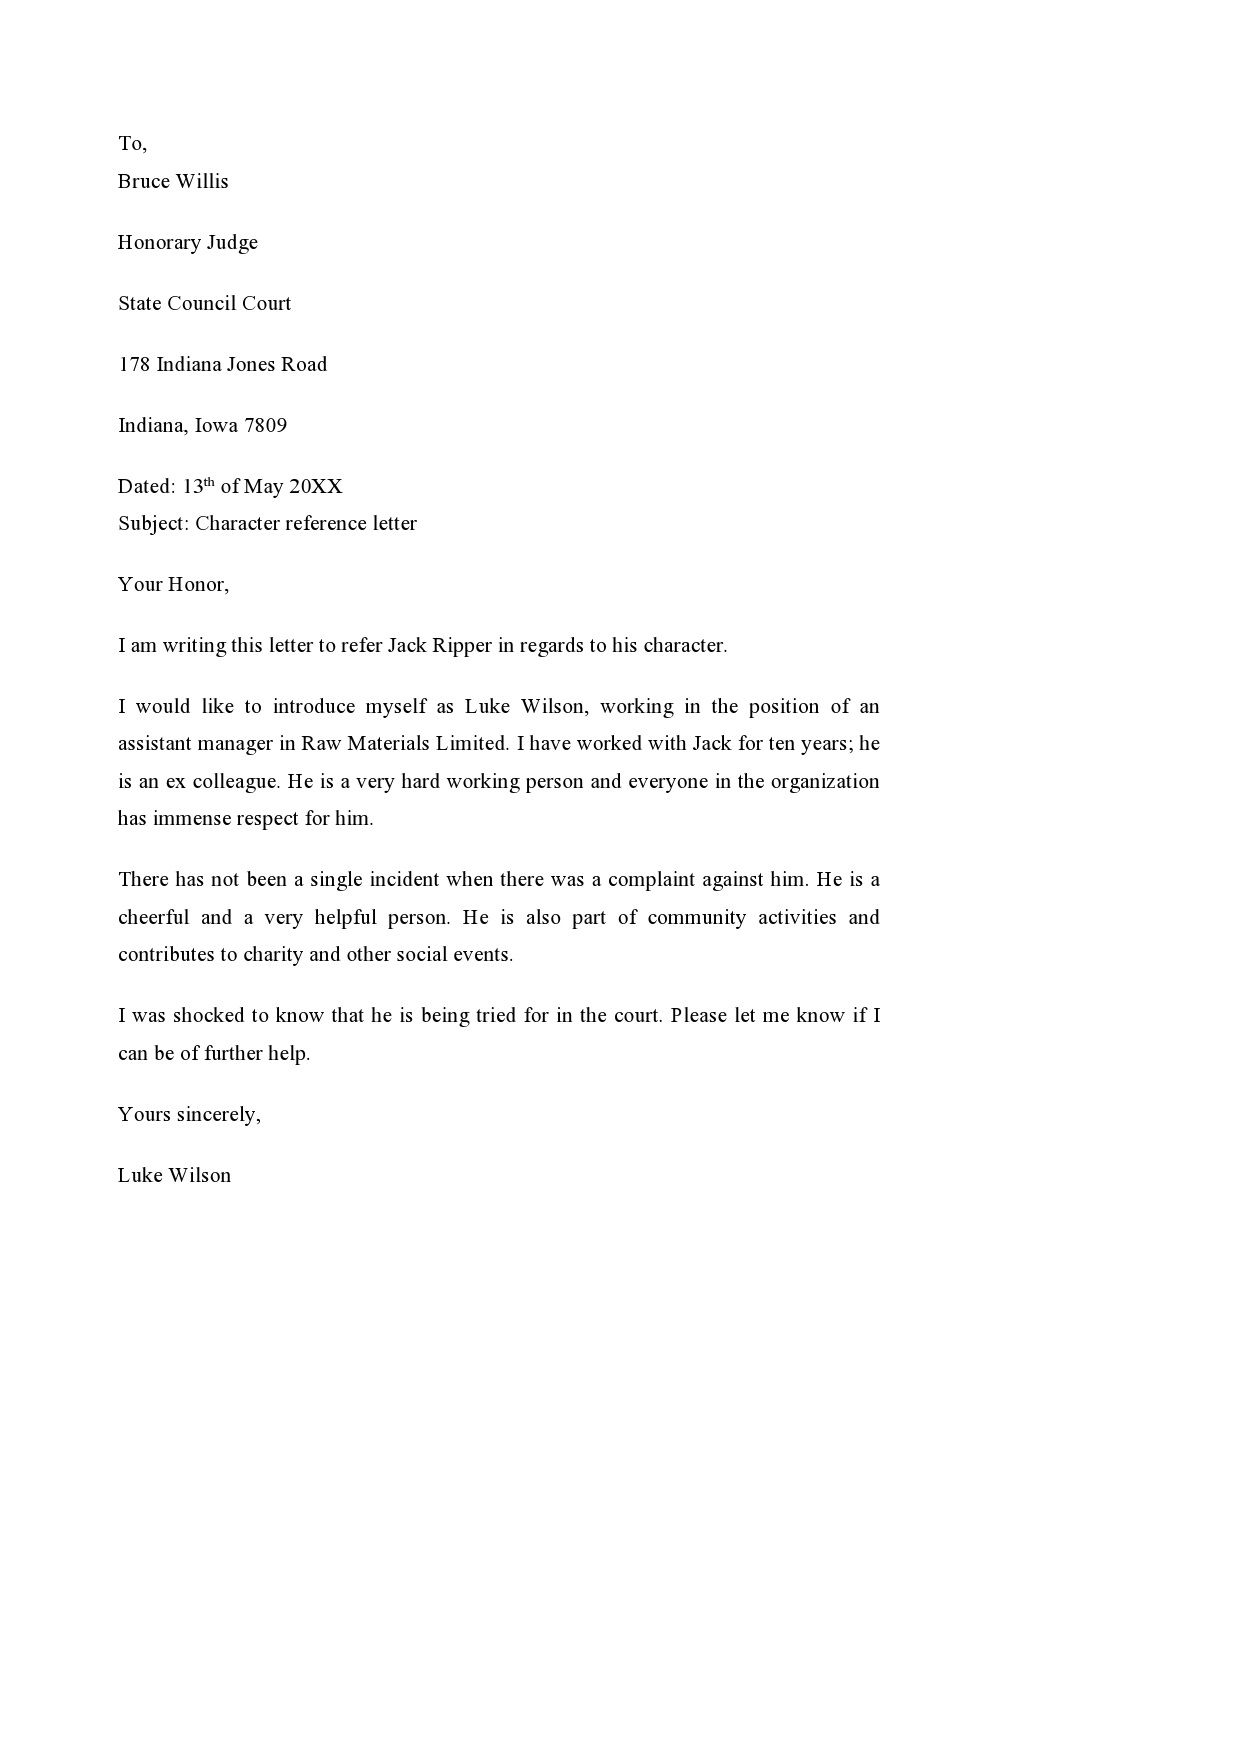 001 Imposing Letter Of Reference Template Design  For Employee Word Coworker TeacherFull